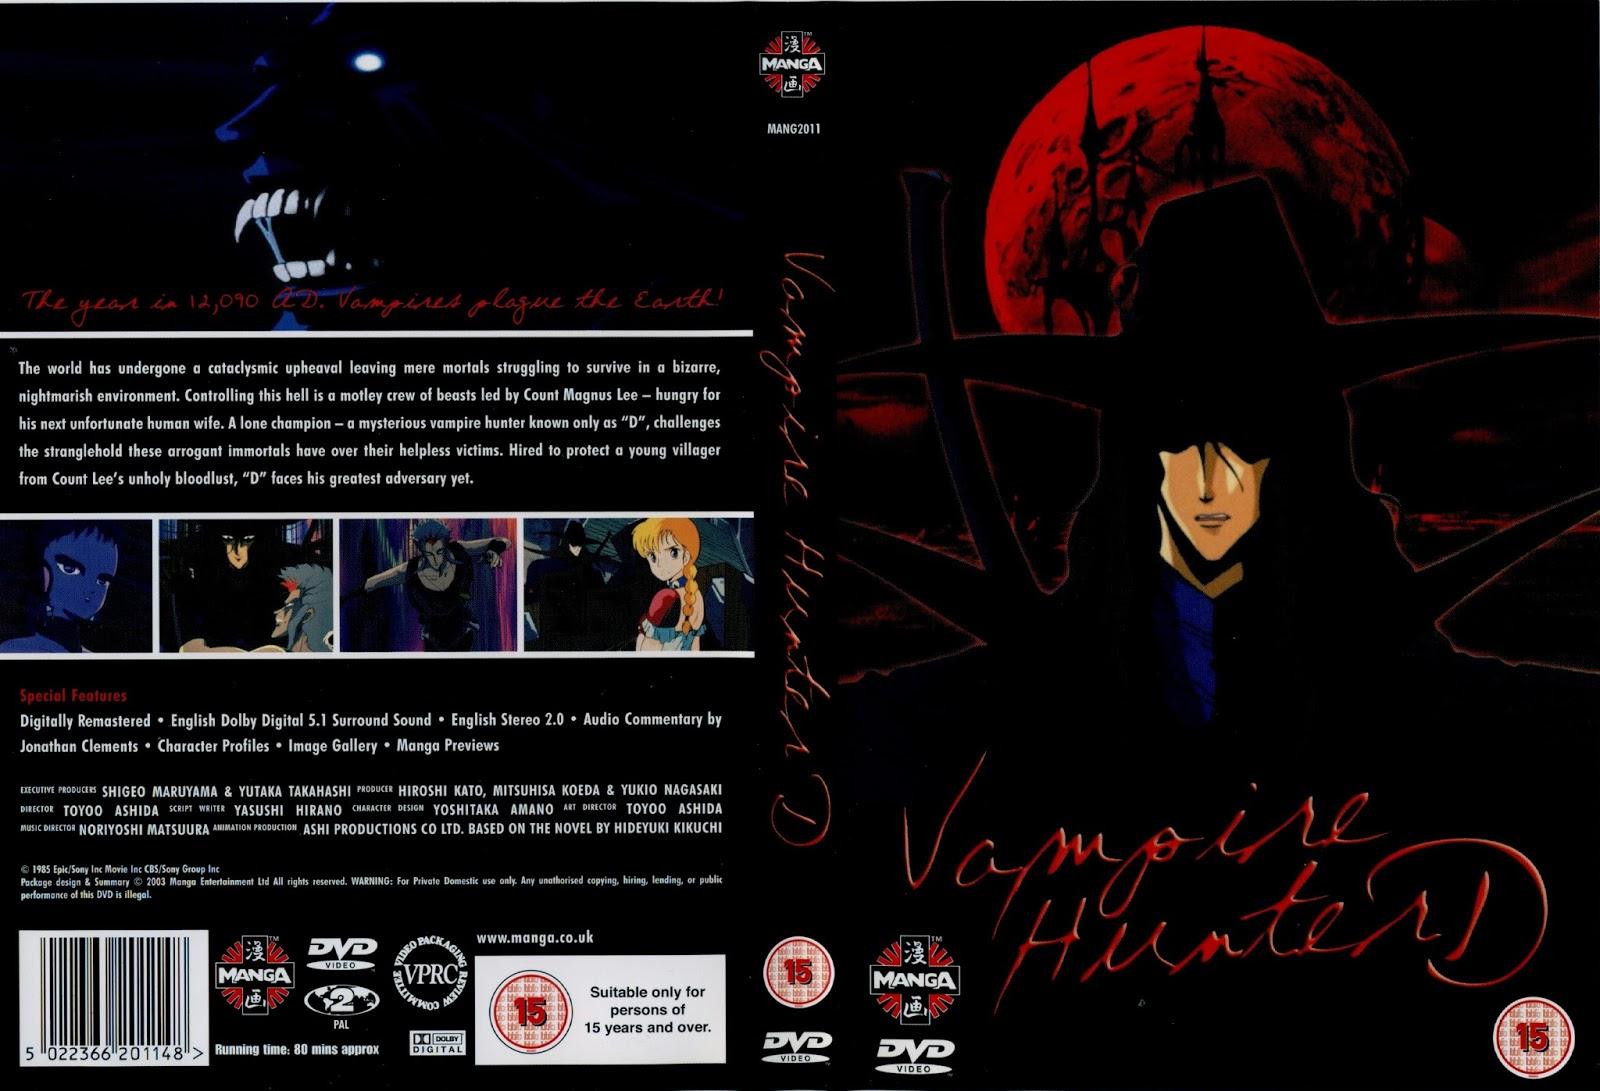 vampire+hunter+d+dvd+video+cover+jacket+manga+cartoon+for+sale+rent+inside - Vampire Hunter D[1985][Castellano][Remasterizado][Mega][AVI] - Anime no Ligero [Descargas]